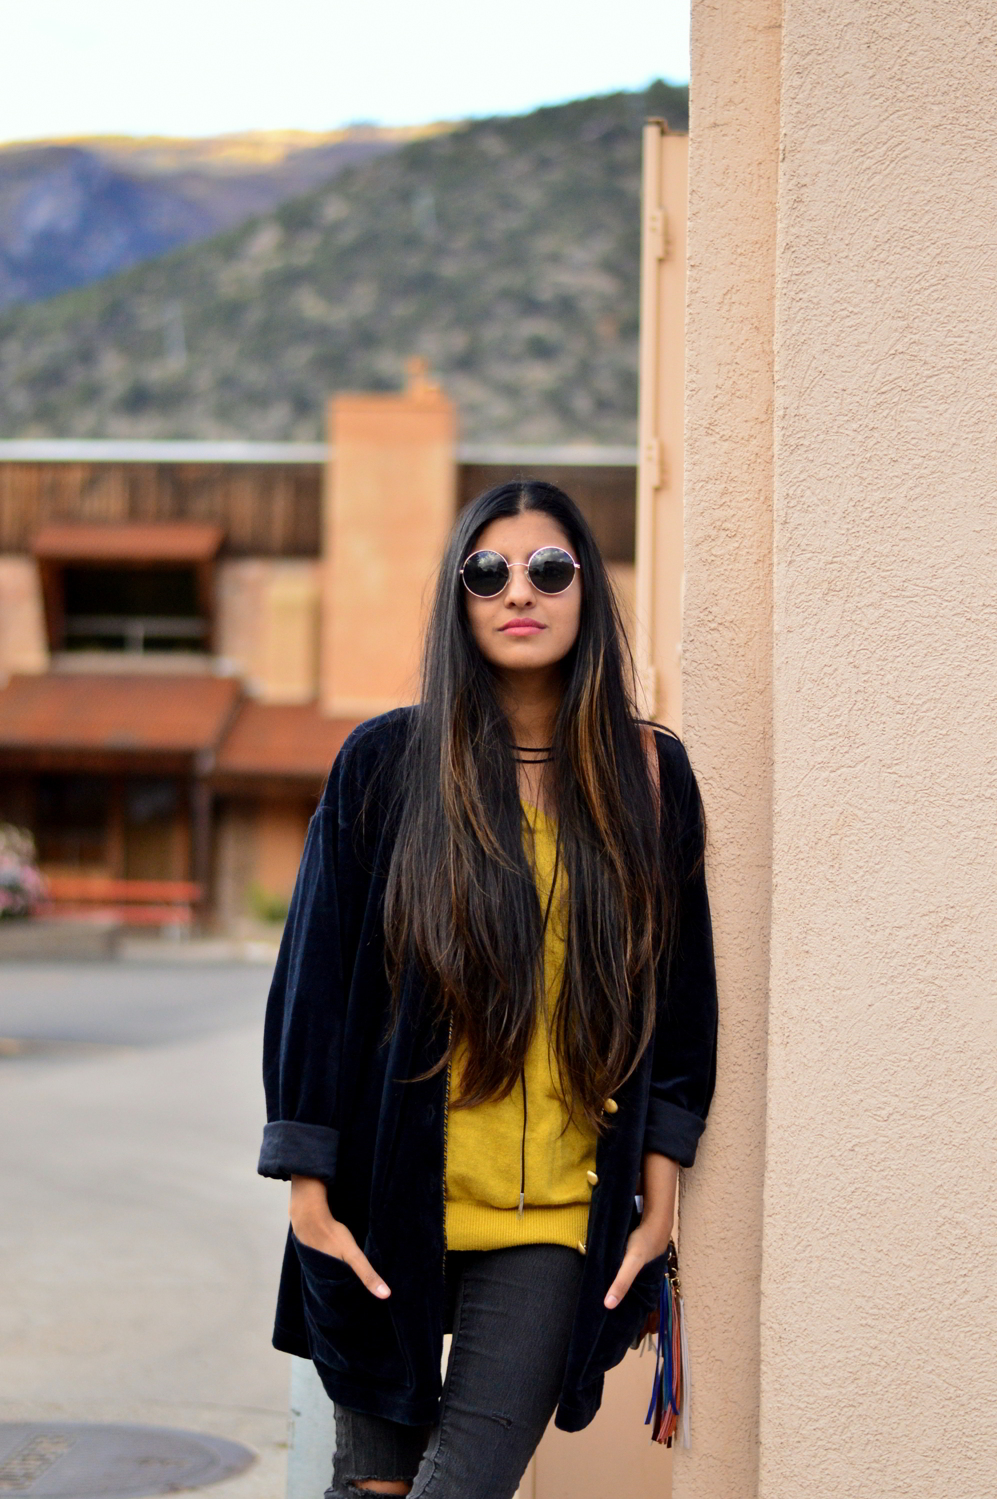 velvet-oversized-cardigan-fall-style-colorado-travel-blogger-outfit-boho-retro 2